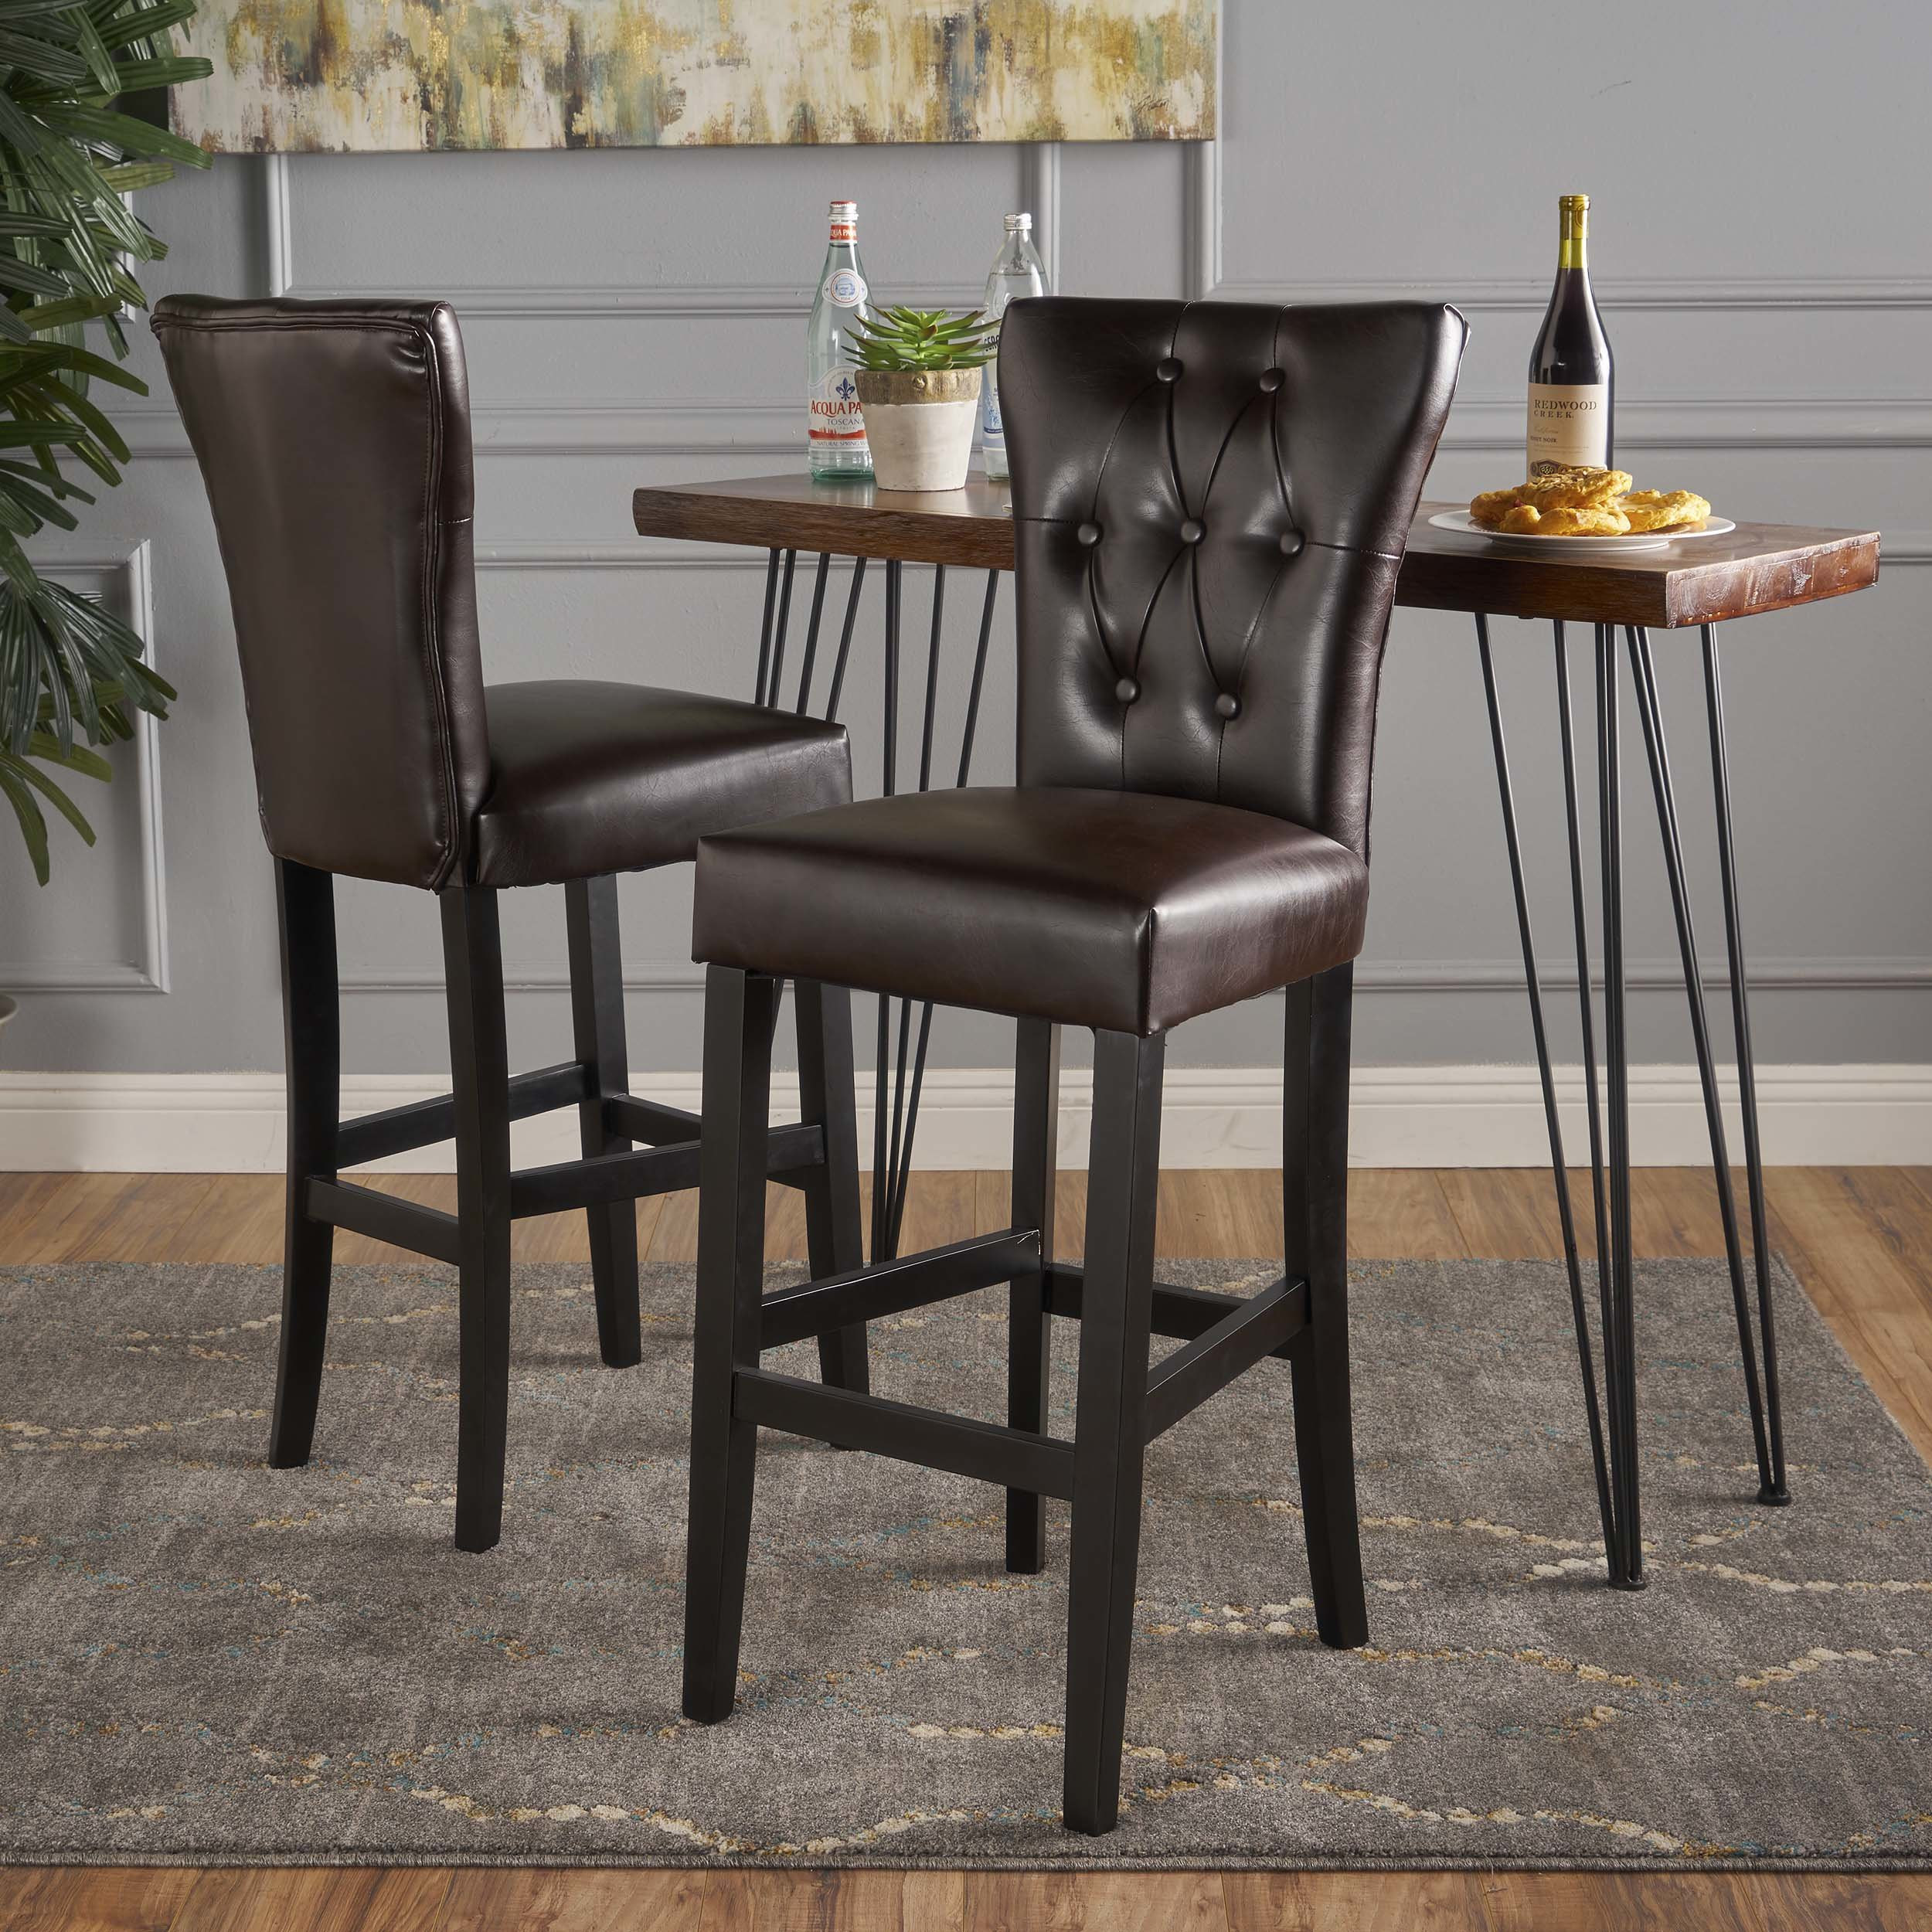 floor vase umbrella stand of darby home co schiller 30 bar stool reviews wayfair ca with regard to schiller 30 bar stool